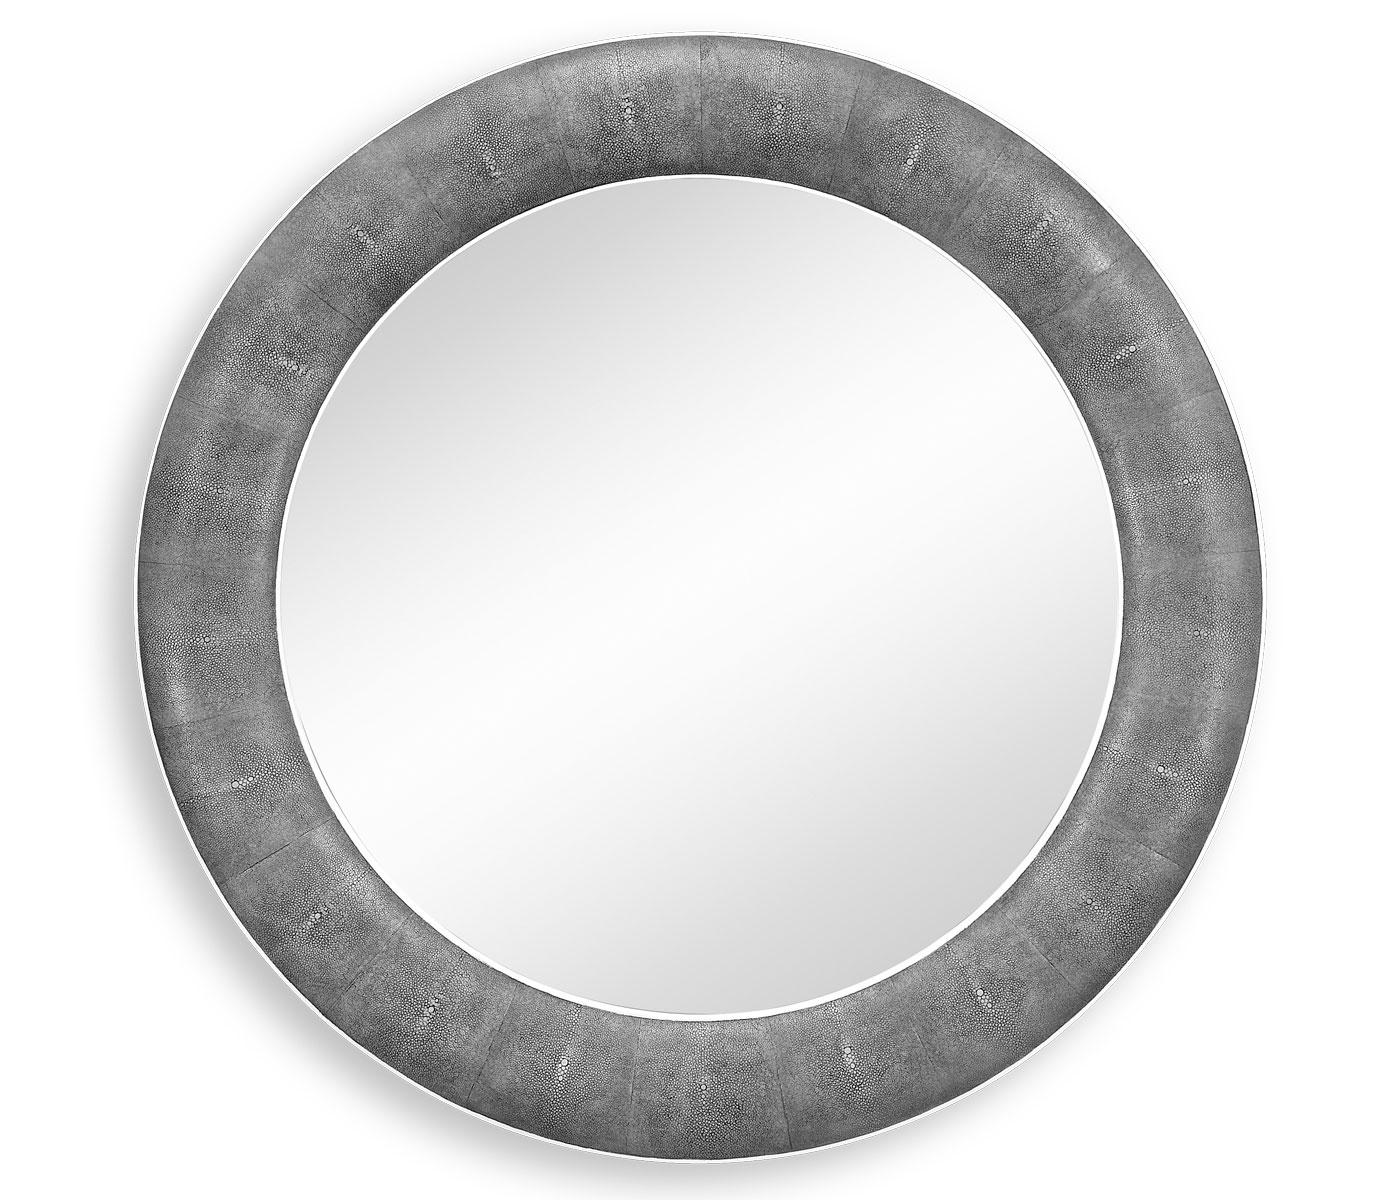 Designer Grey Leather Round Wall Mirror Swanky Interiors